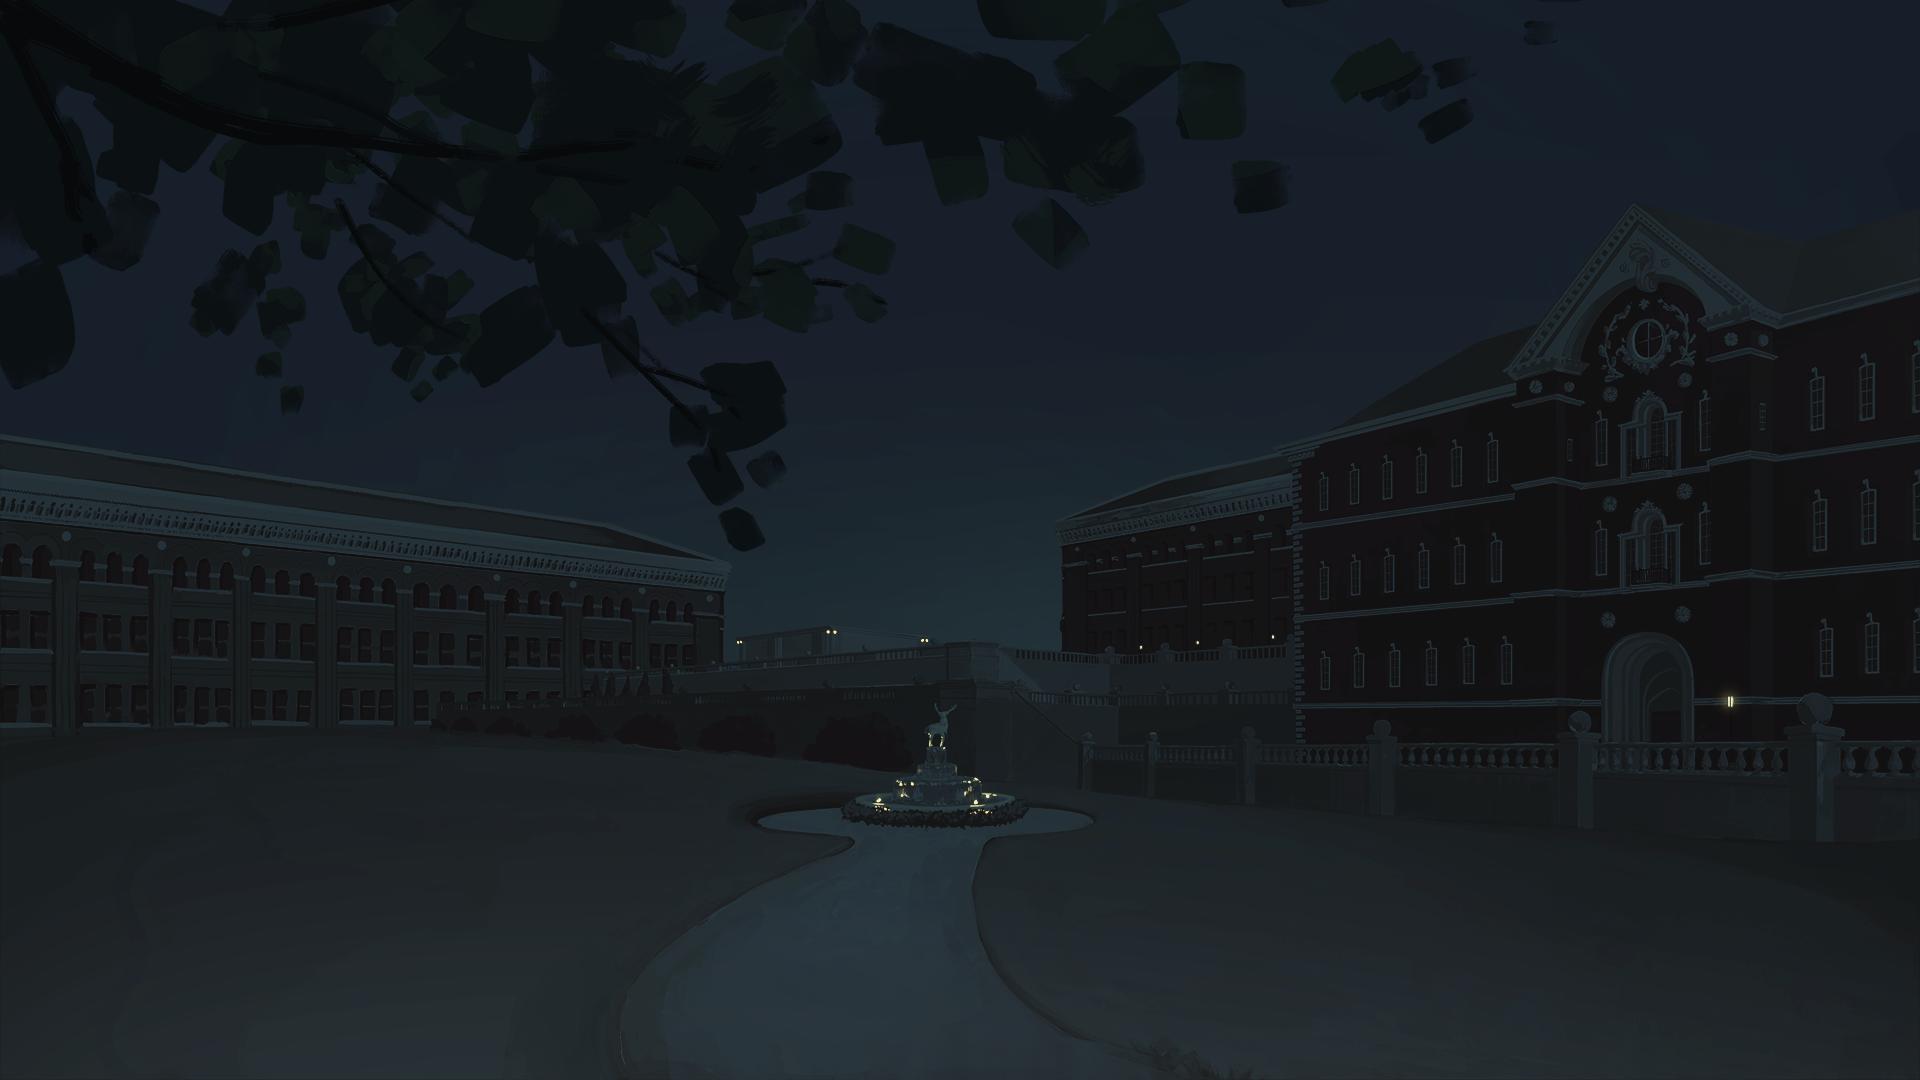 University Courtyard 03 | B. Chau